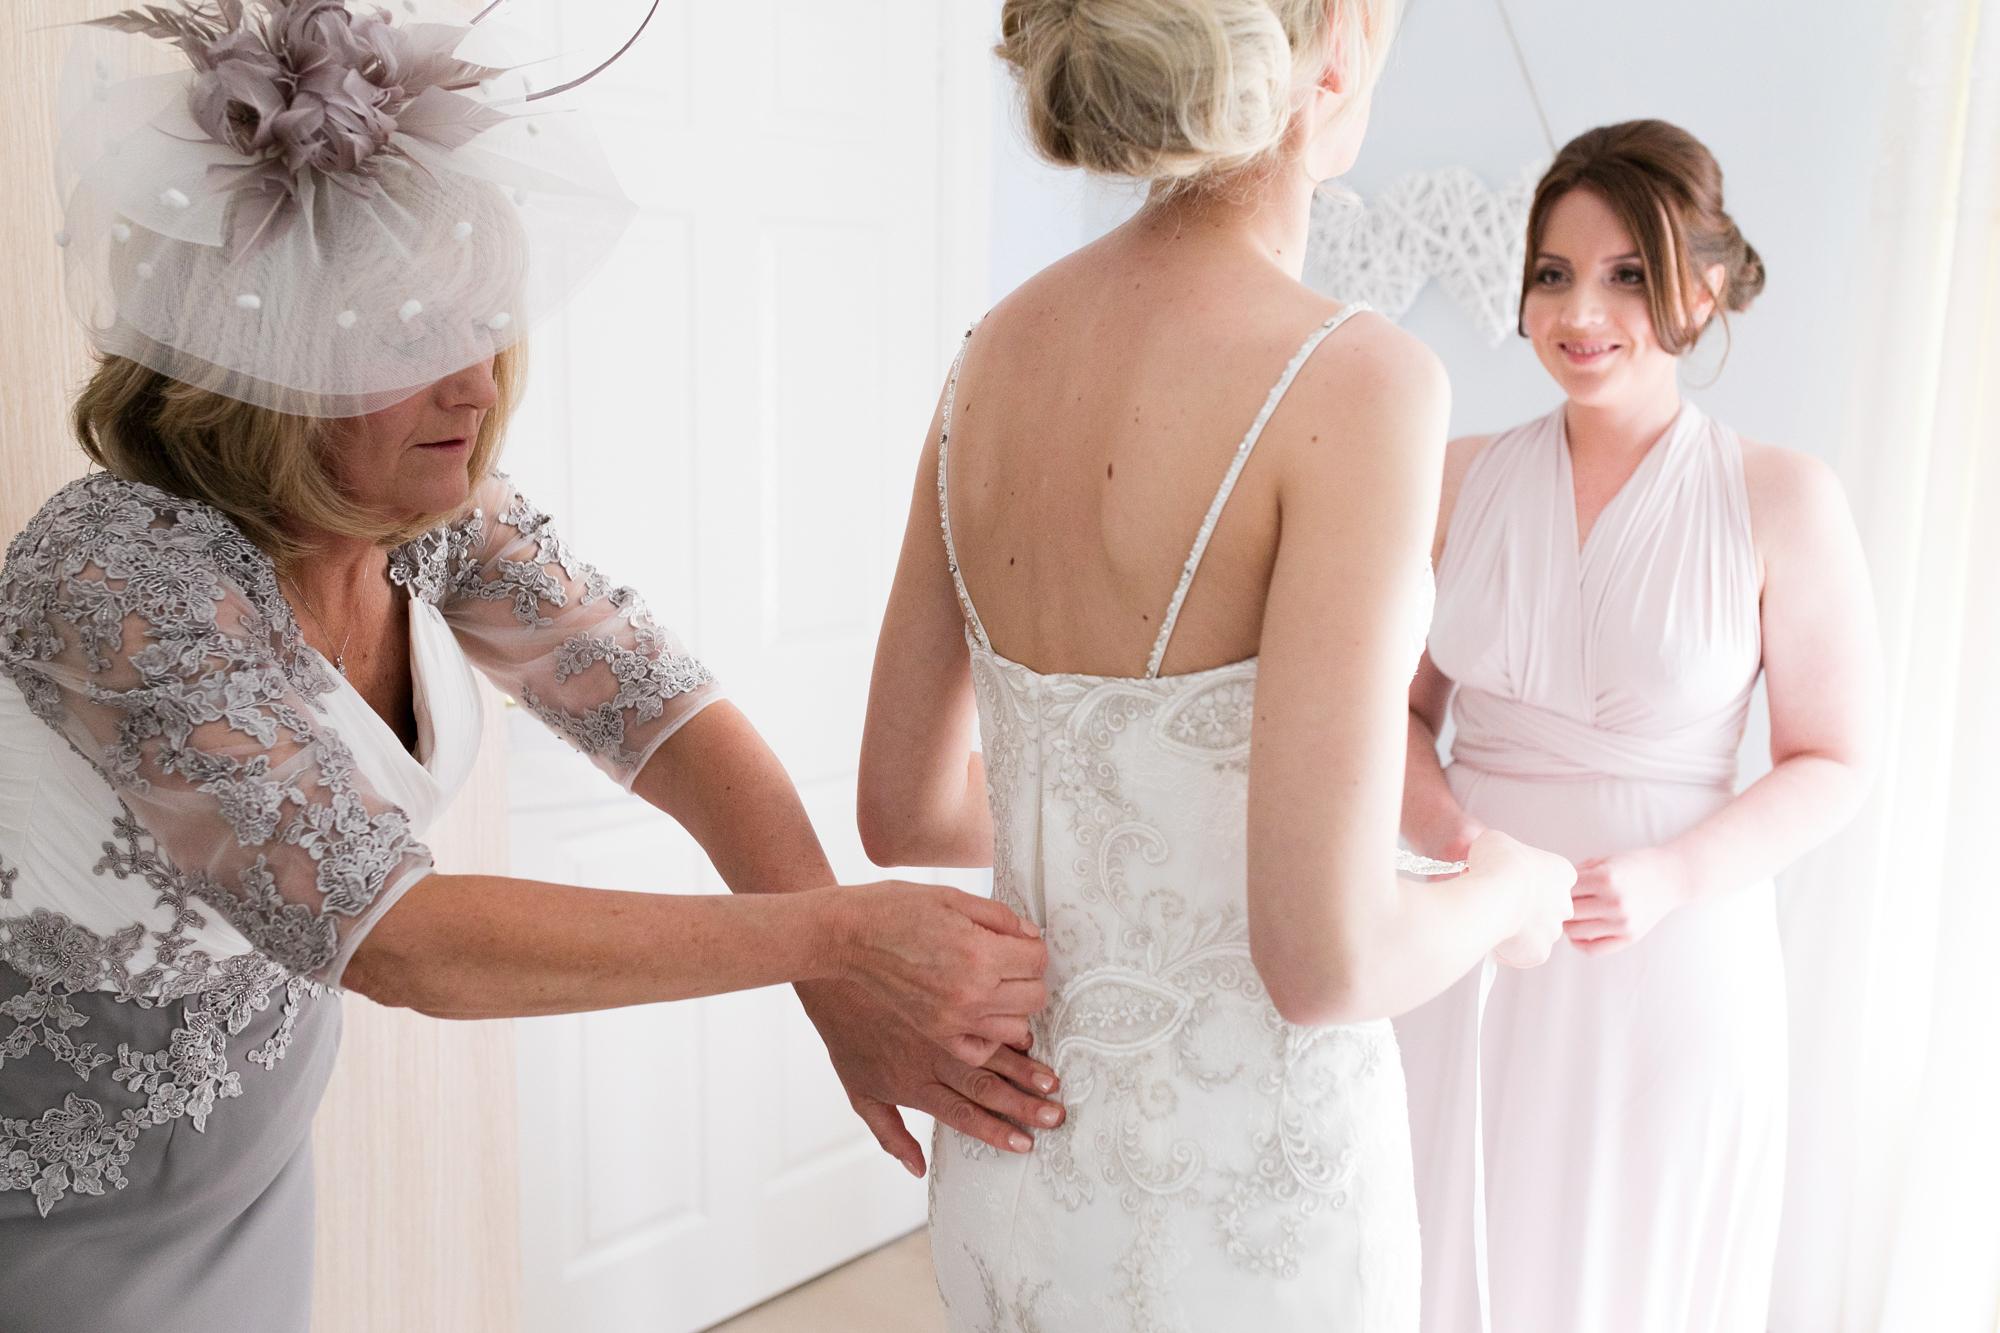 Headlam hall wedding photographer-17.jpg